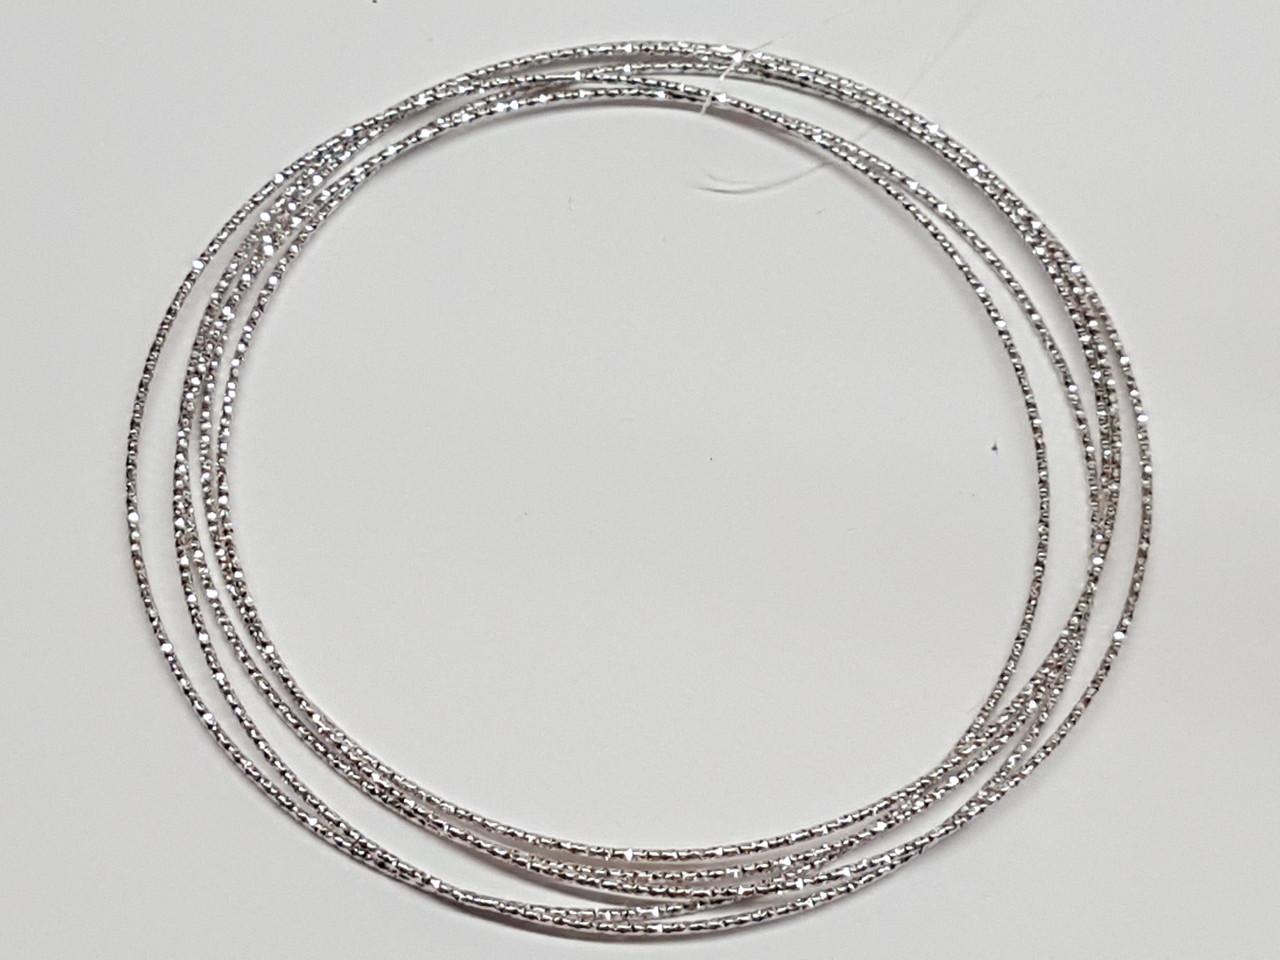 Серебряный жесткий браслет. Артикул 905-0412BR